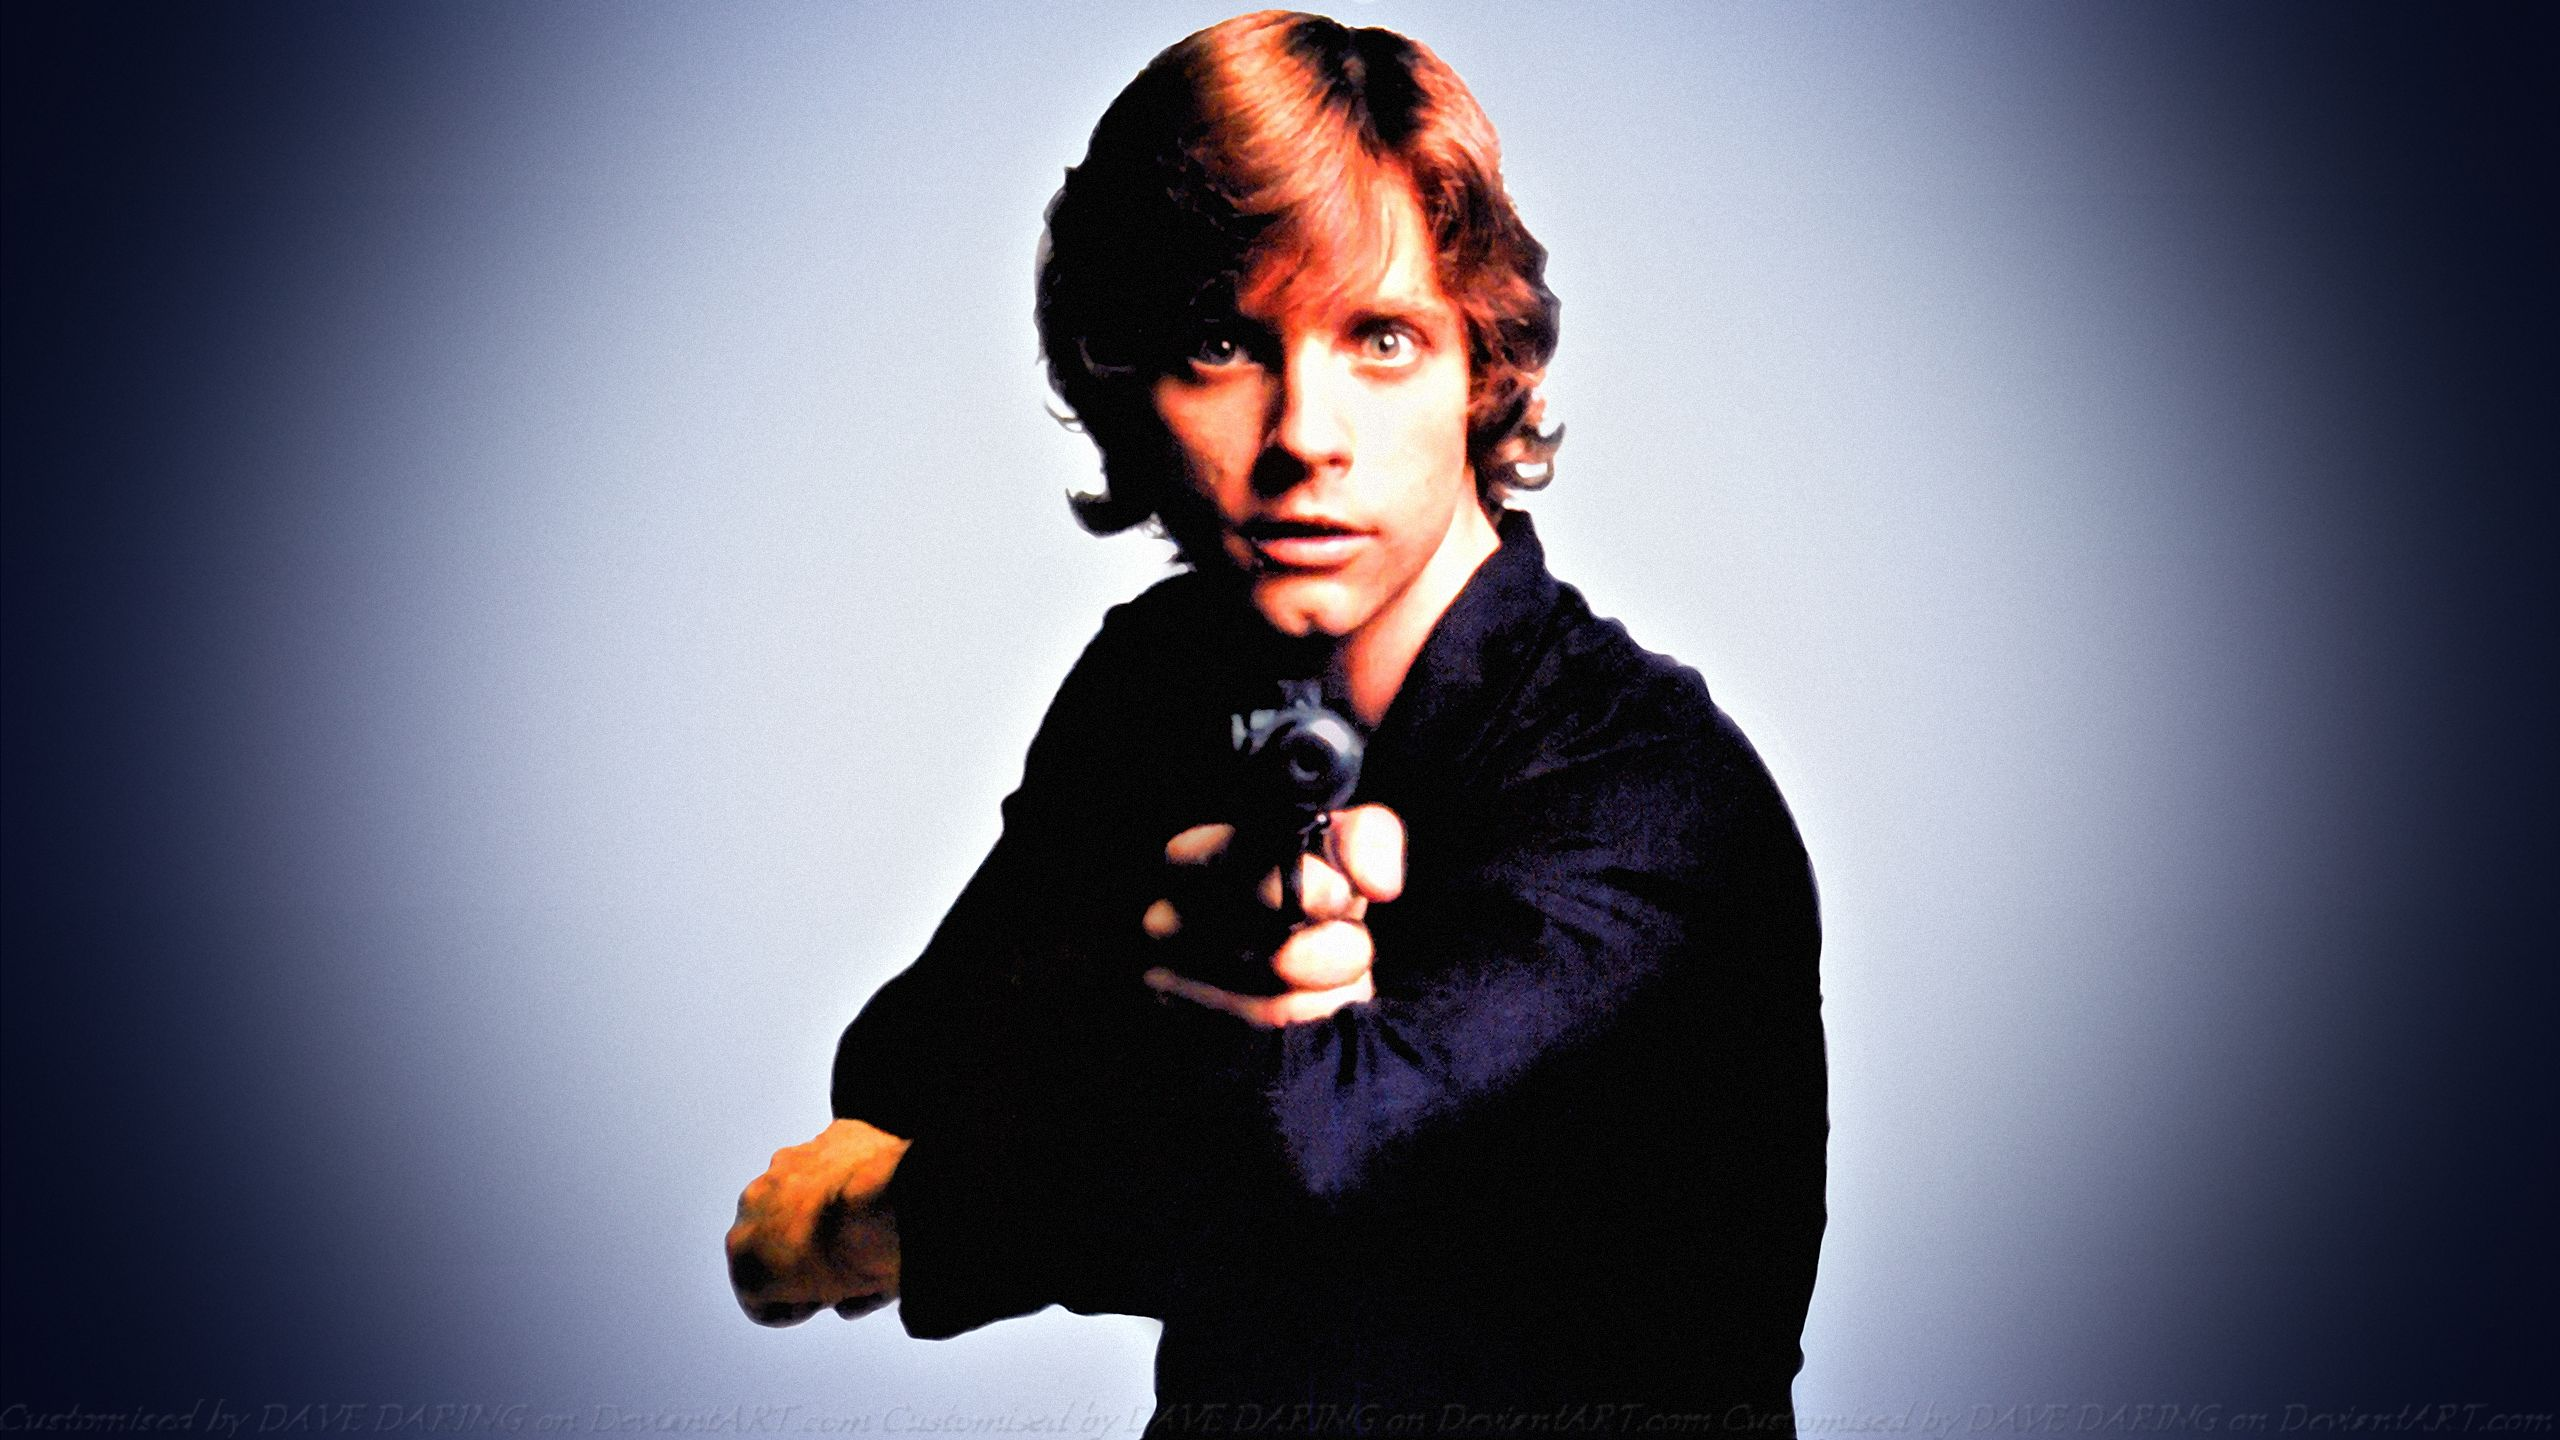 Mark Hamill Skywalker Jedi Knight III by Dave-Daring